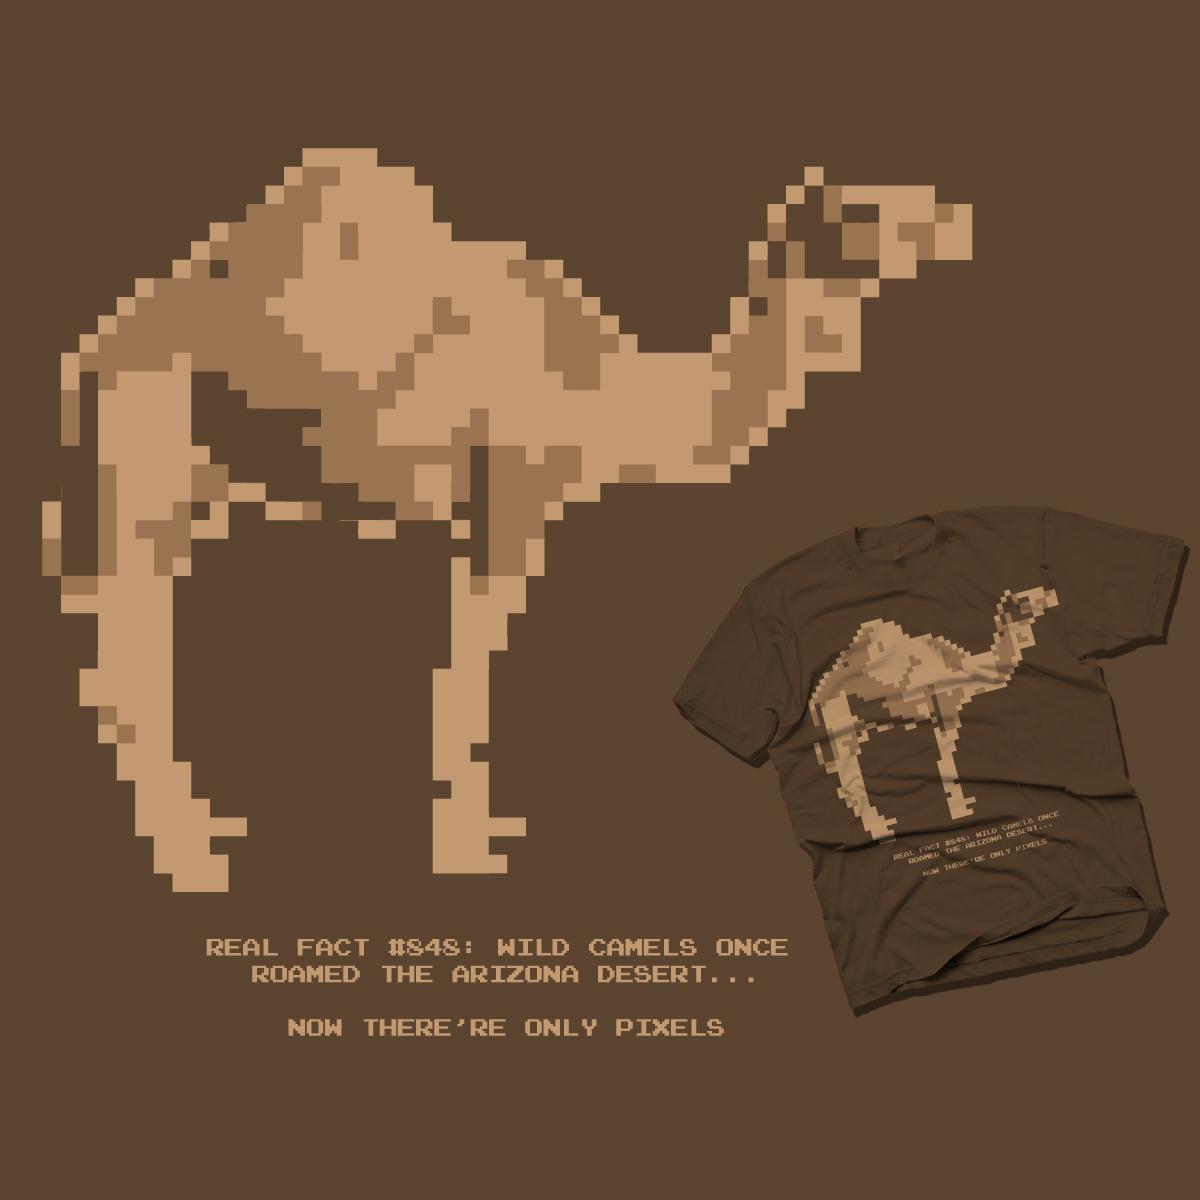 DIGITAL CAMEL by chakz on Threadless